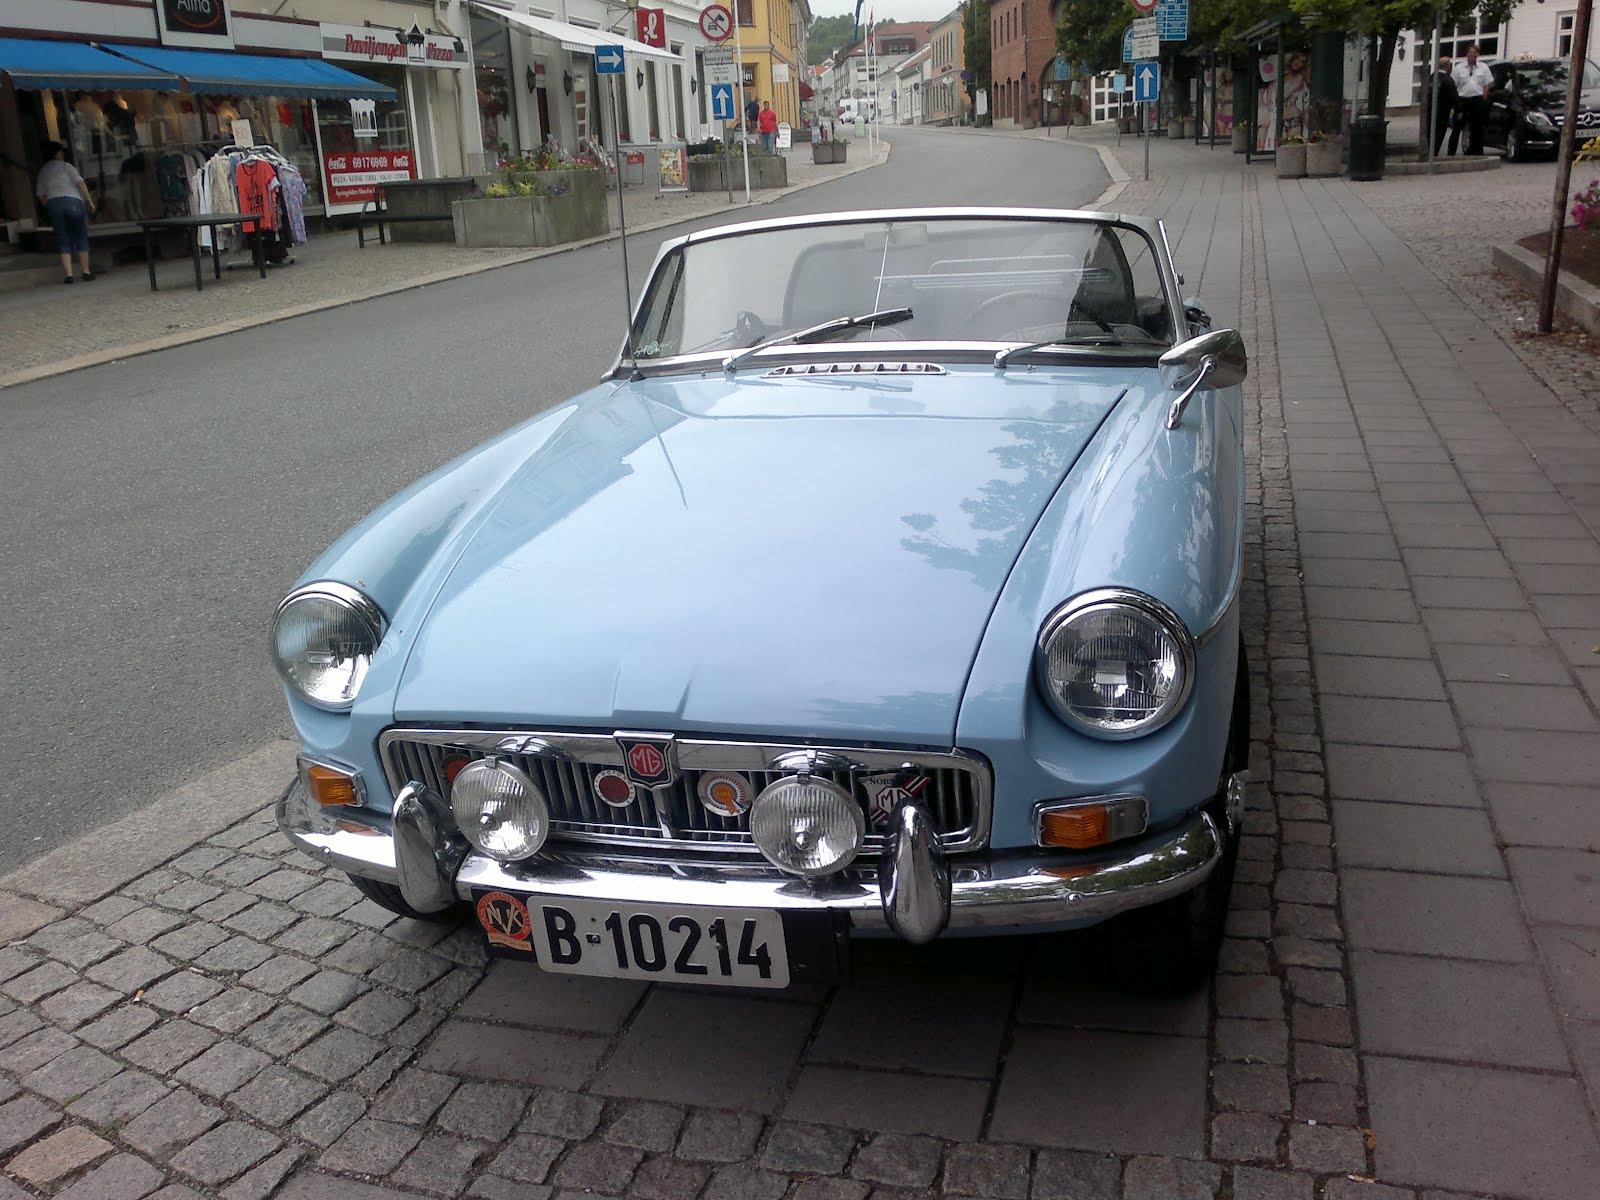 Svend Svendsen - Sri Lanka: old cars - next few blogs